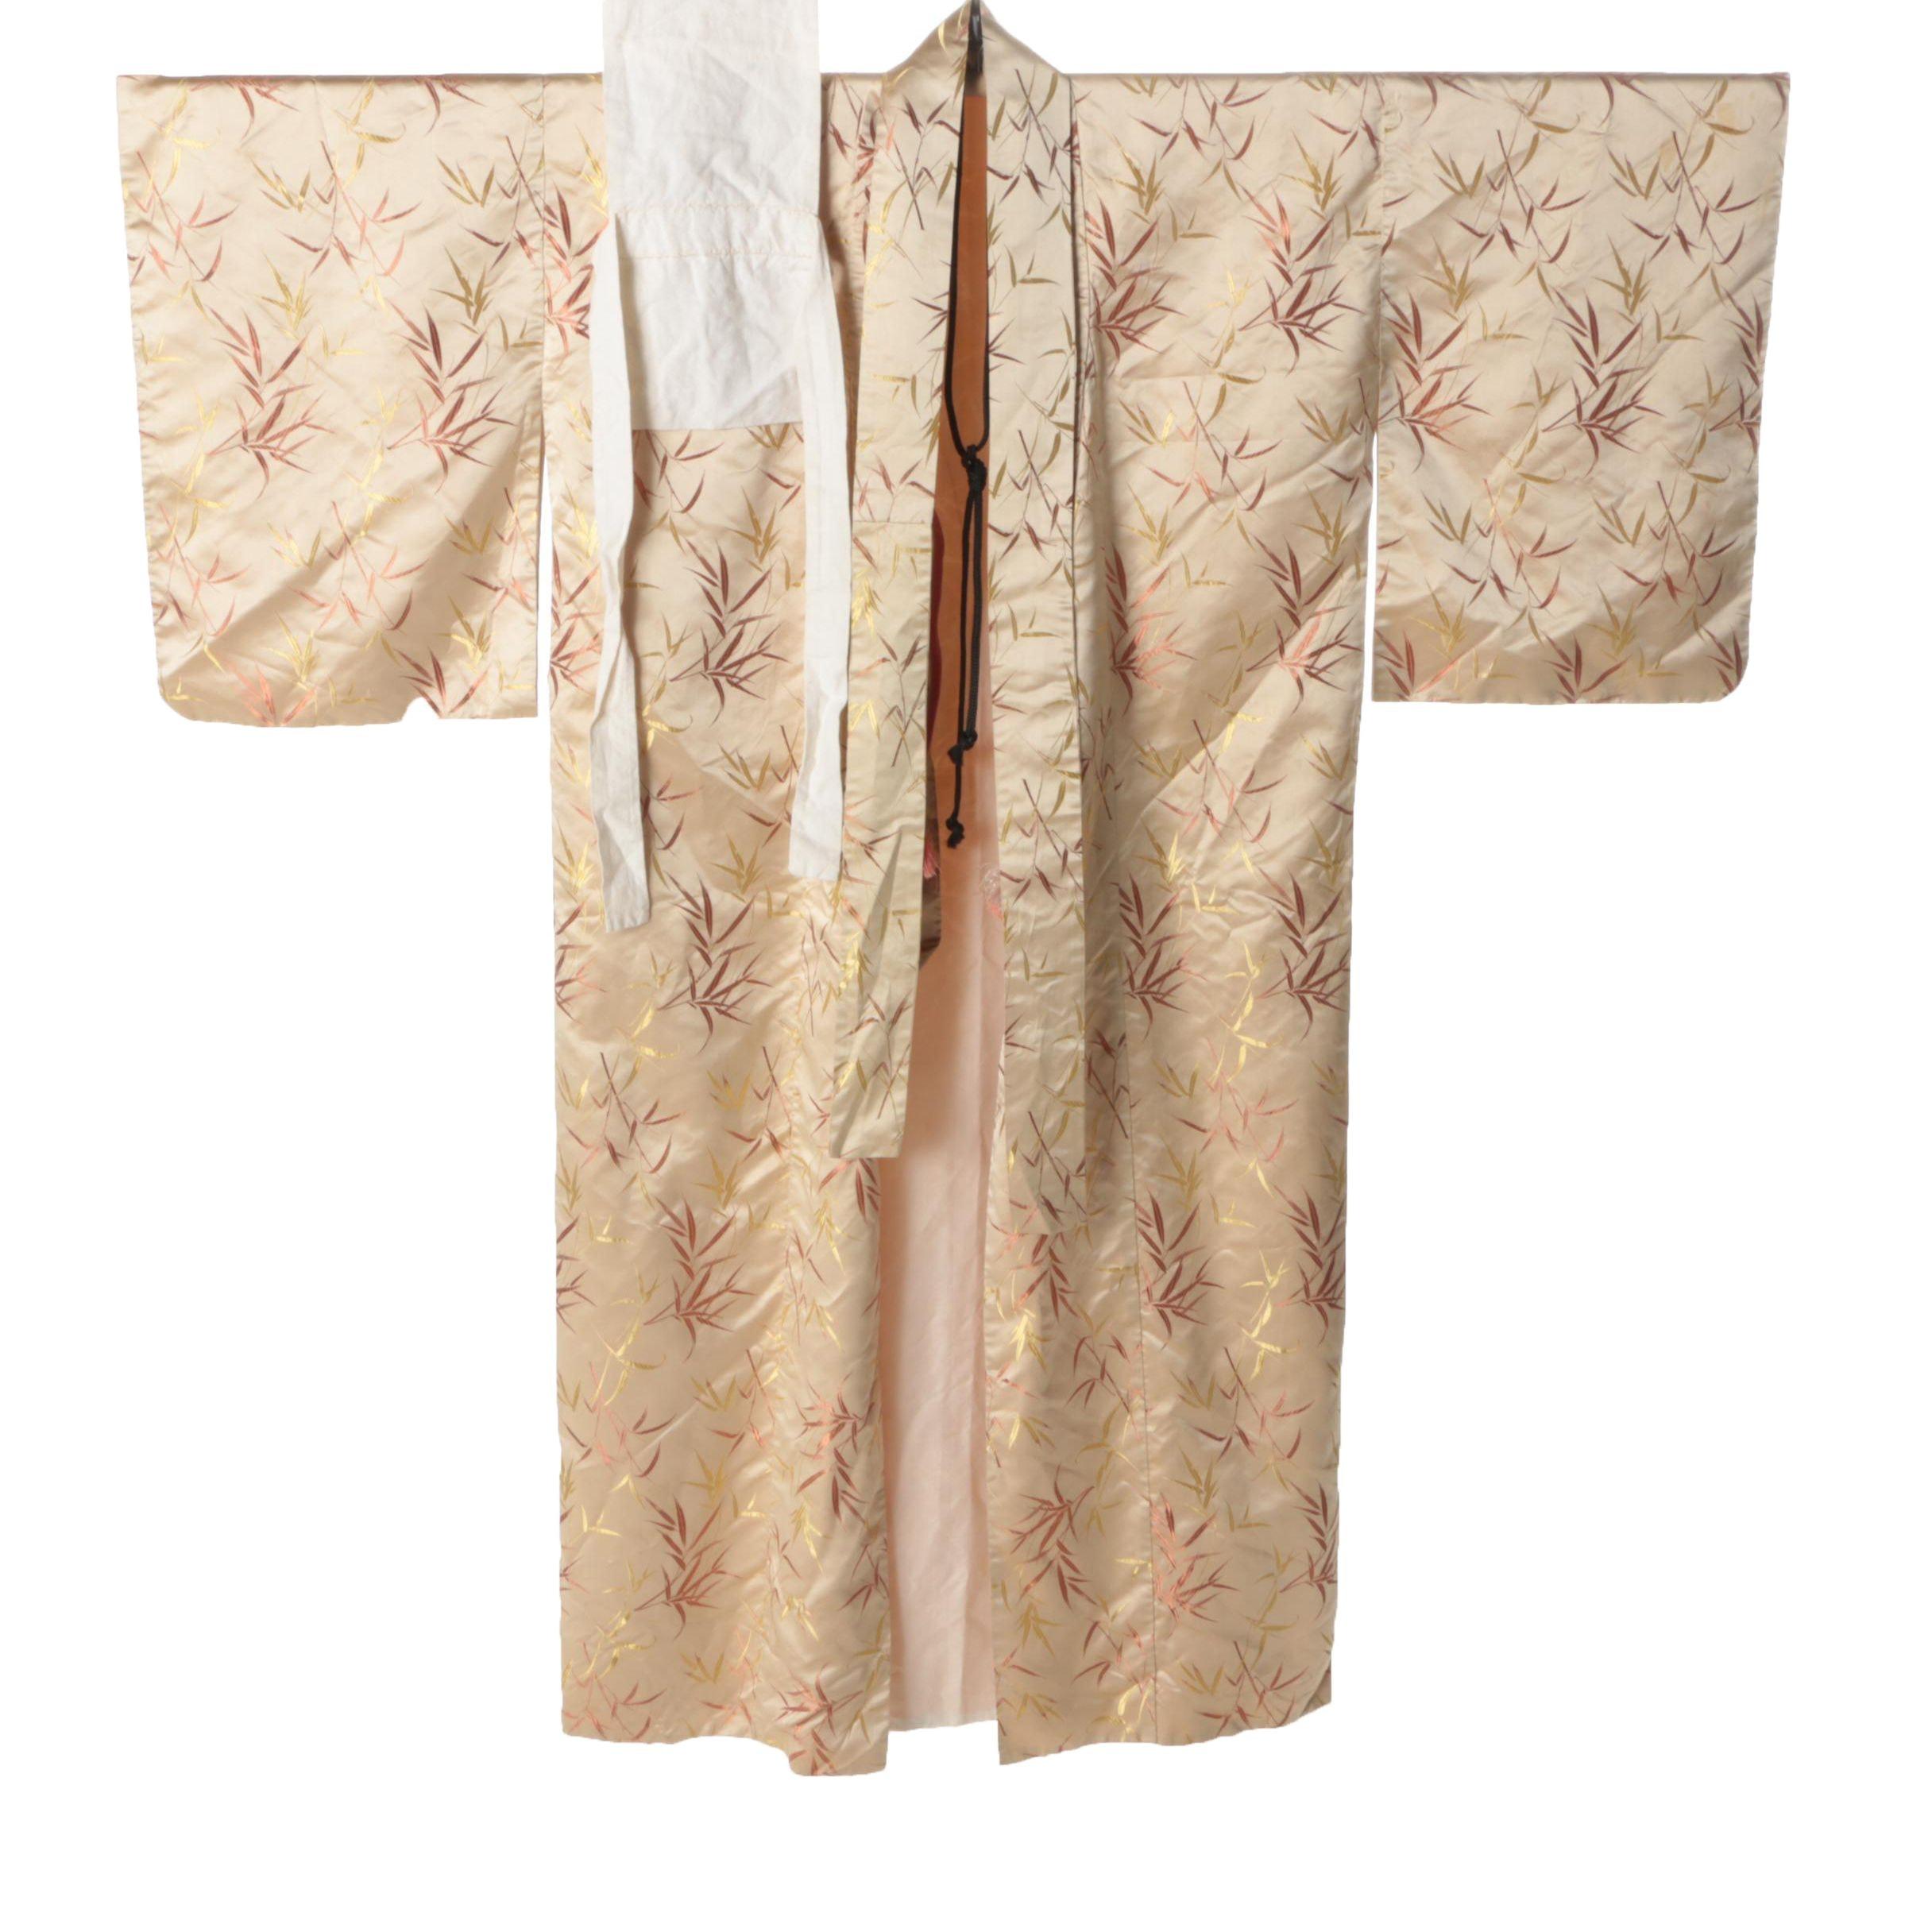 Vintage Japanese Silk Kimono, Tsuke Obi and Obijime